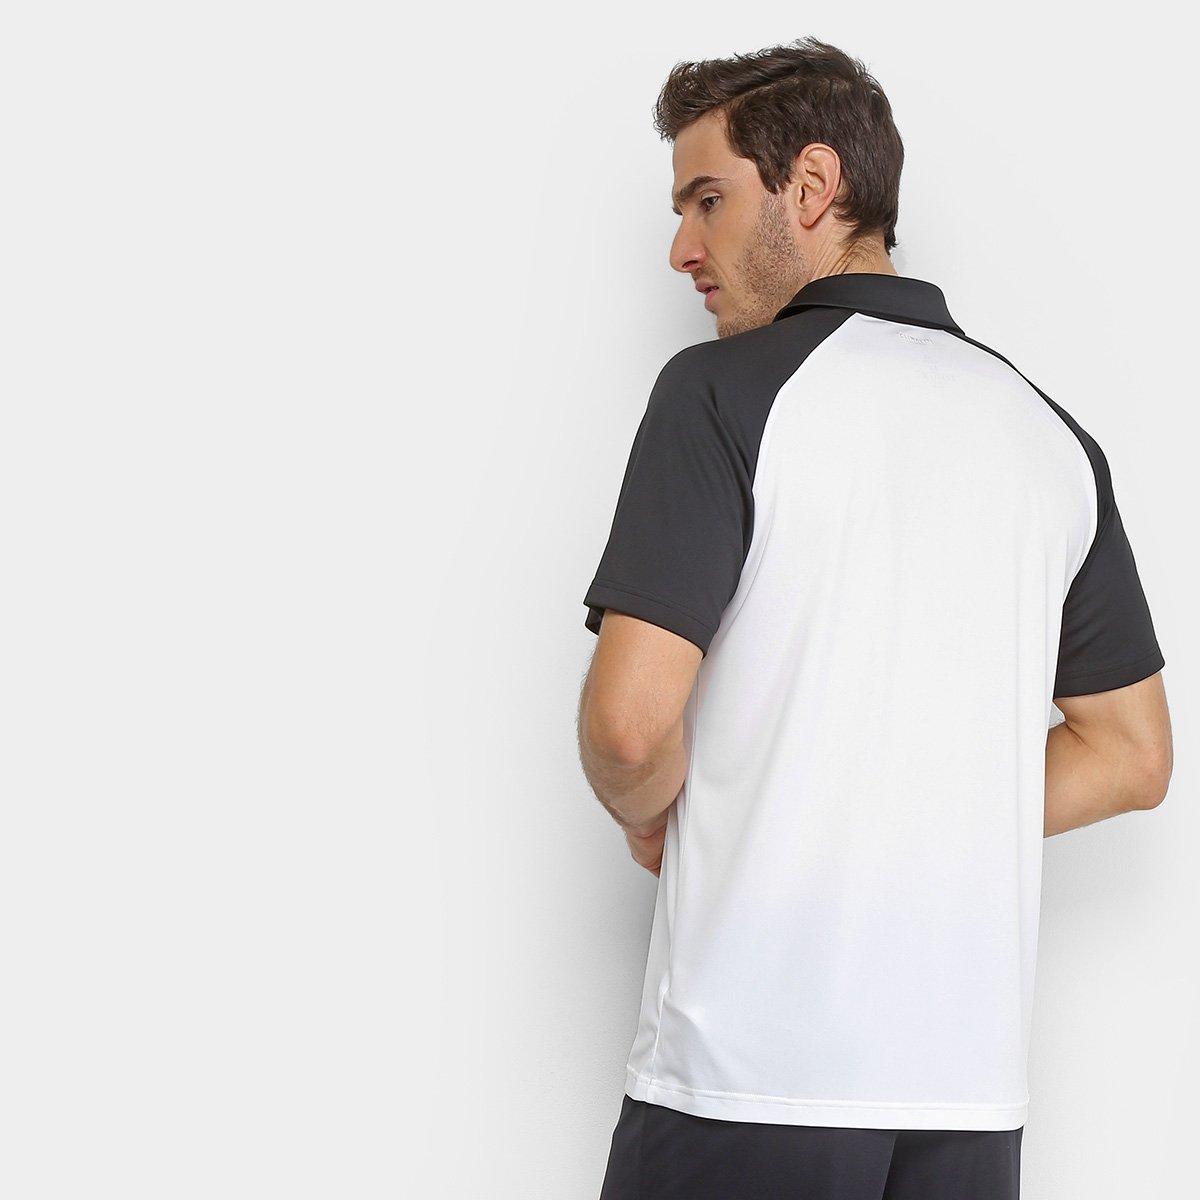 Camisa Polo Adidas ColorBlock Club Masculina - Preto e Branco ... 859b302f8b40f